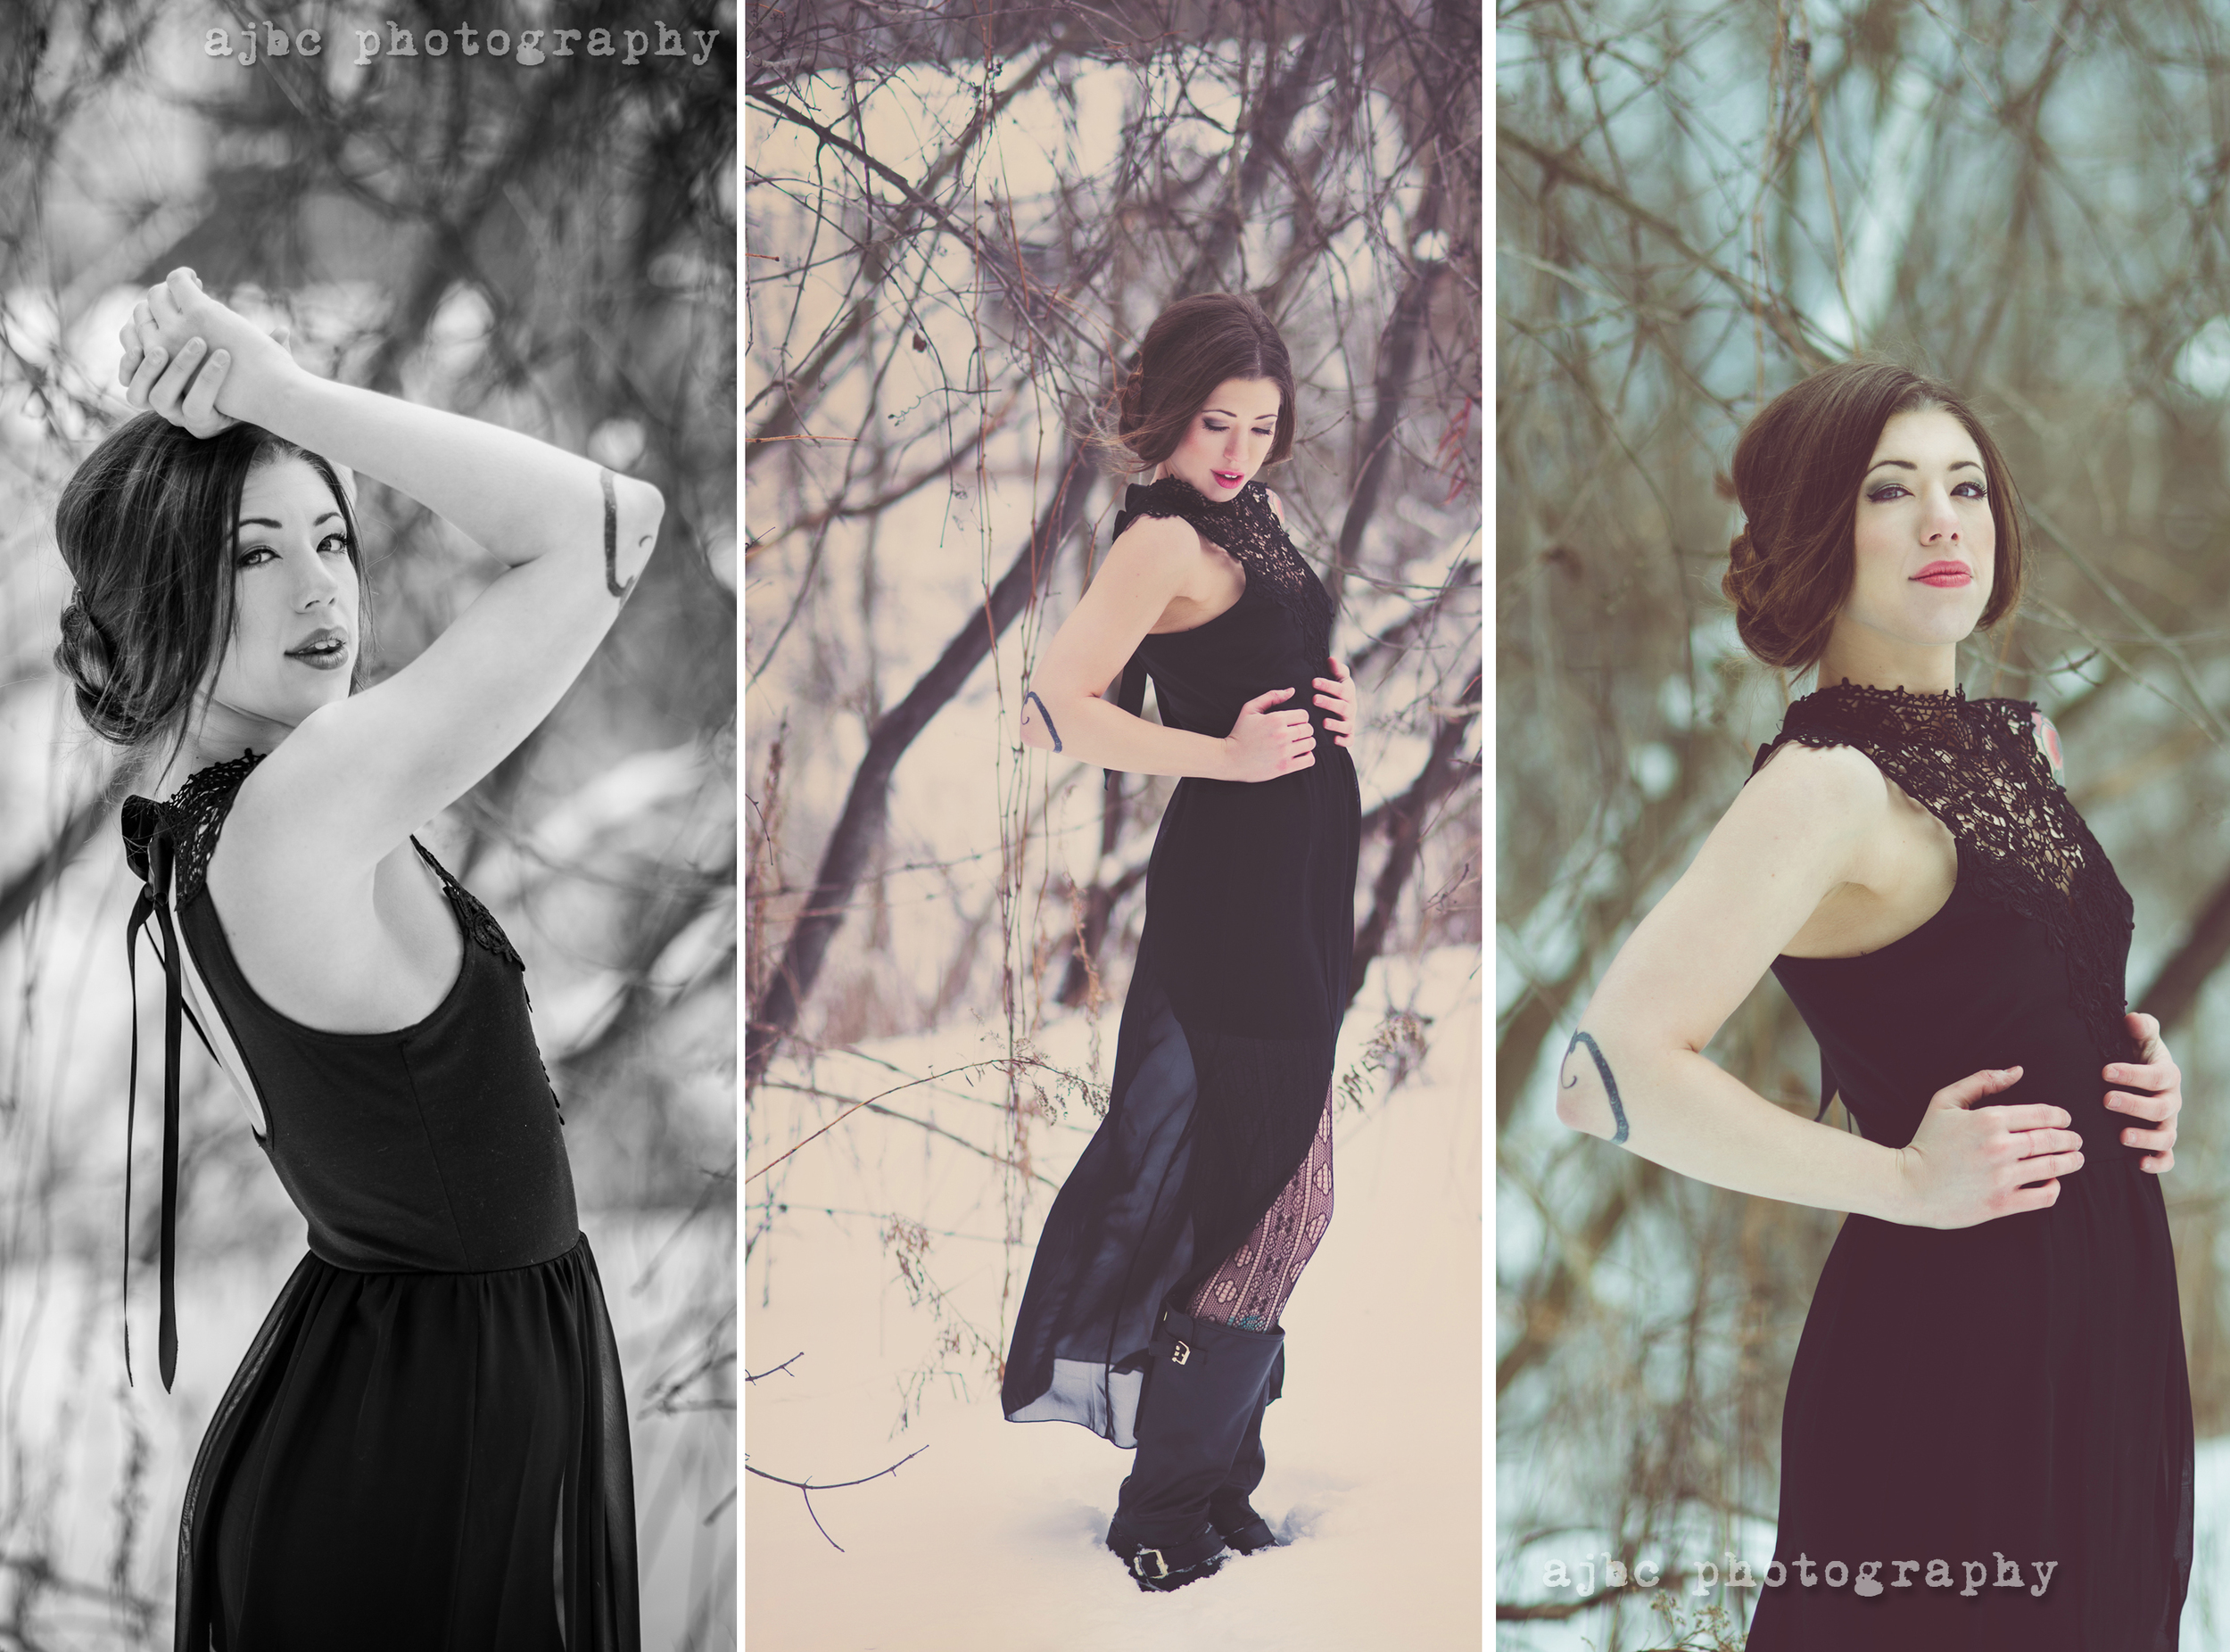 AJBCPhotography_Creative_Portraits_Stylized_PortHuron_MI_F